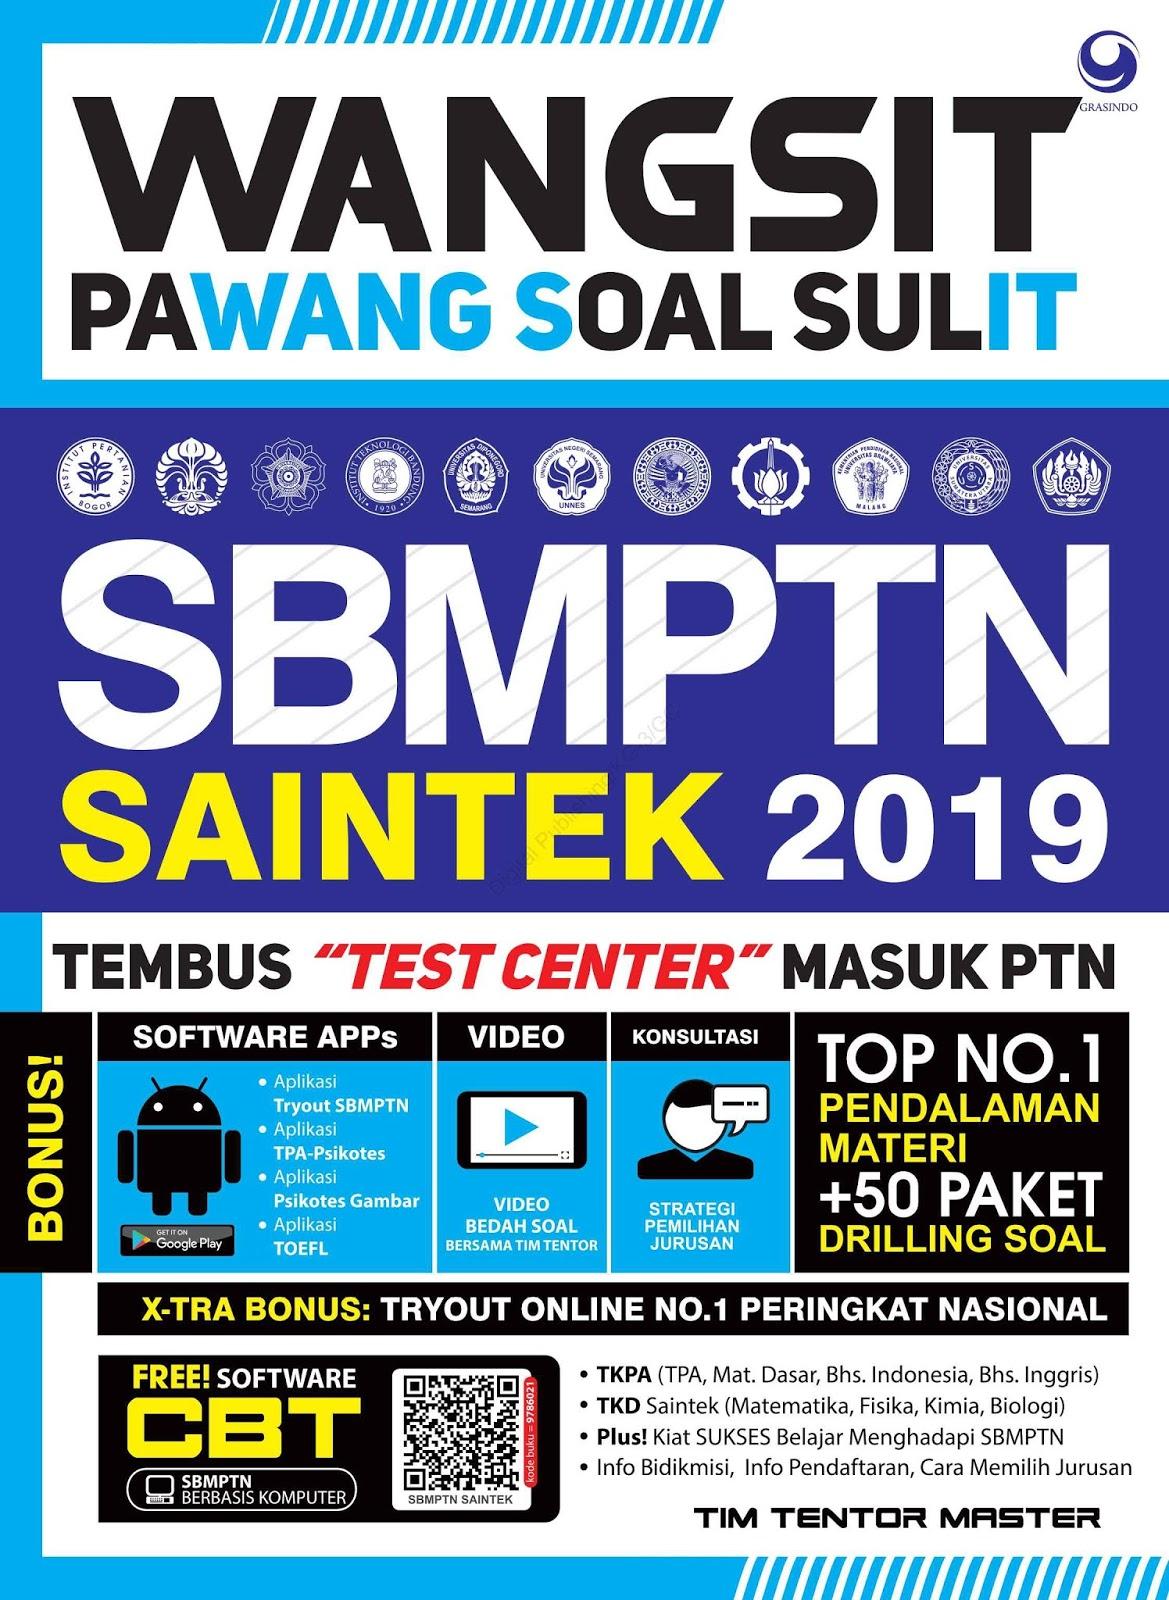 Wangsit (Pawang Soal Sulit) SBMPTN SAINTEK